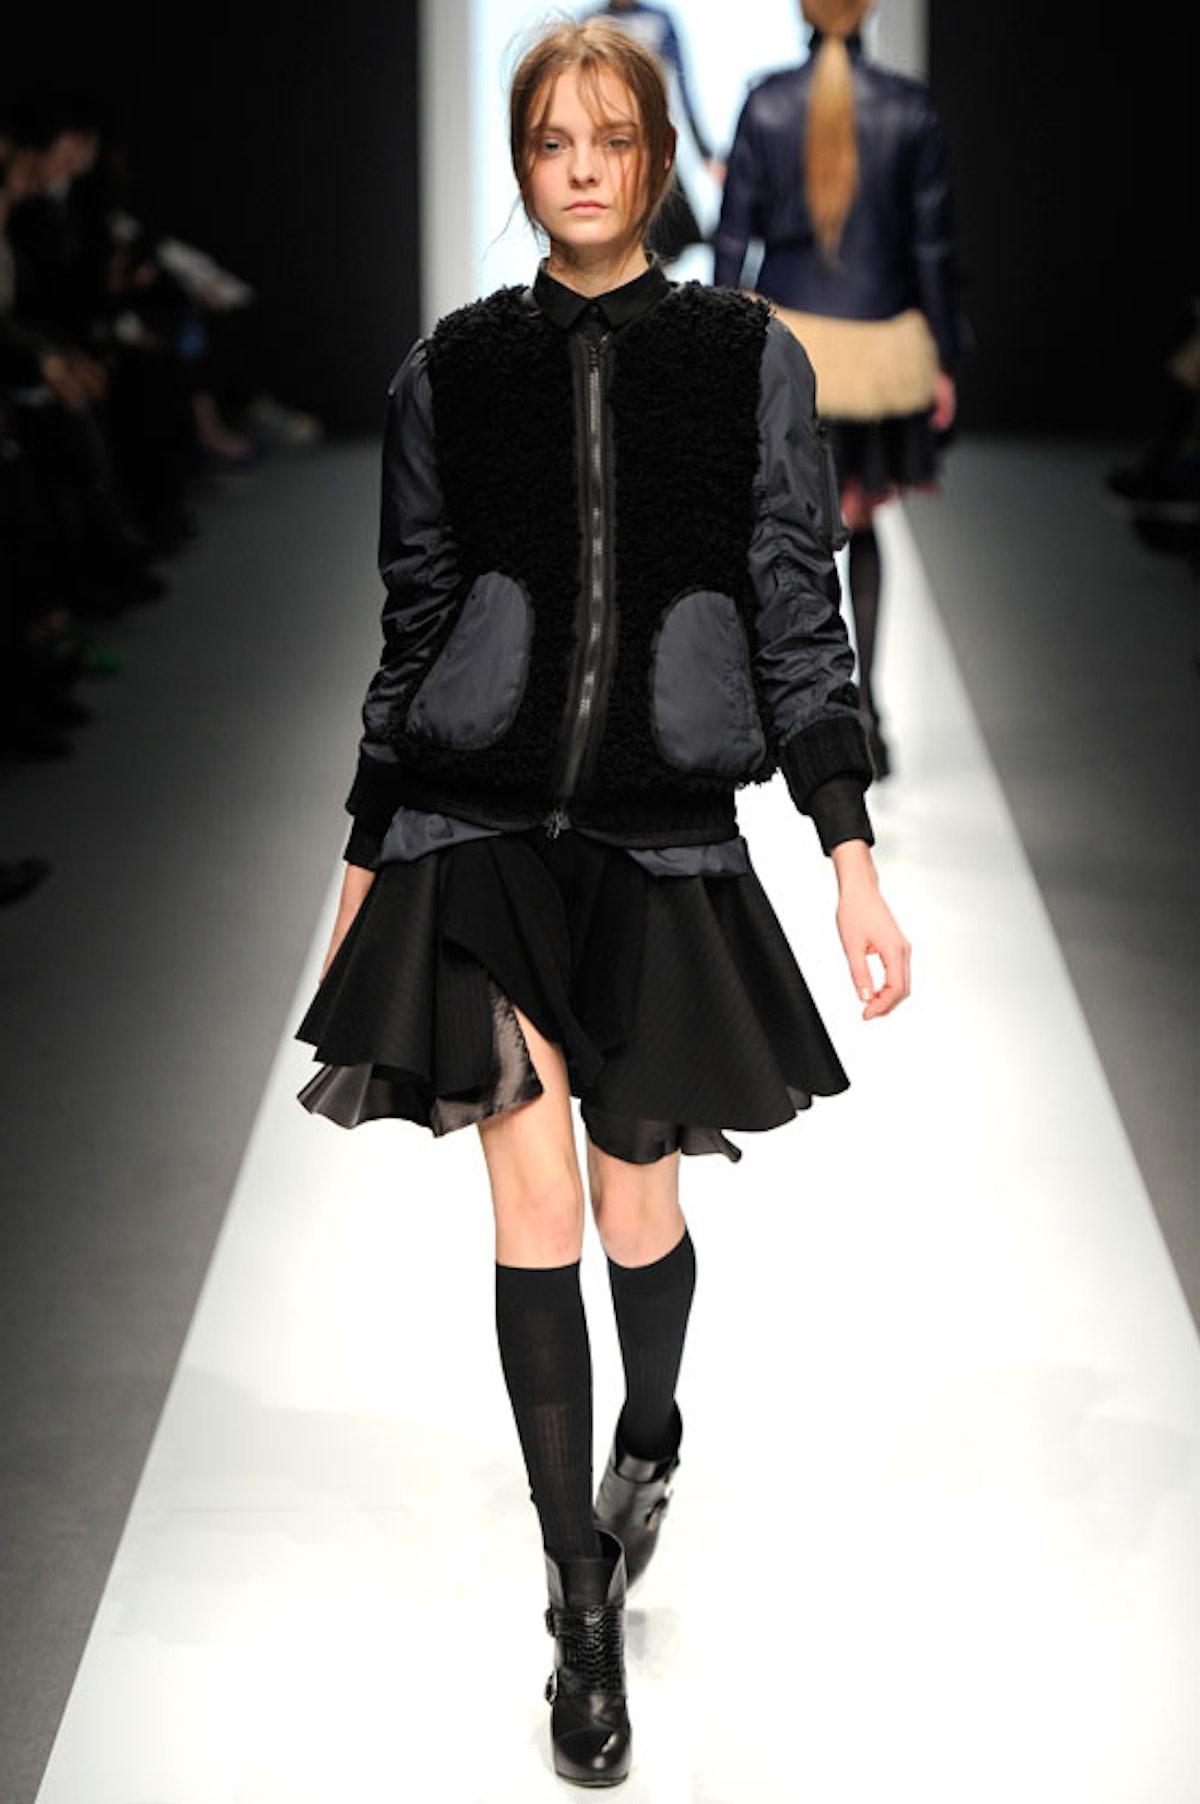 blog-Sacai-Fall-2012-Look-10.jpg